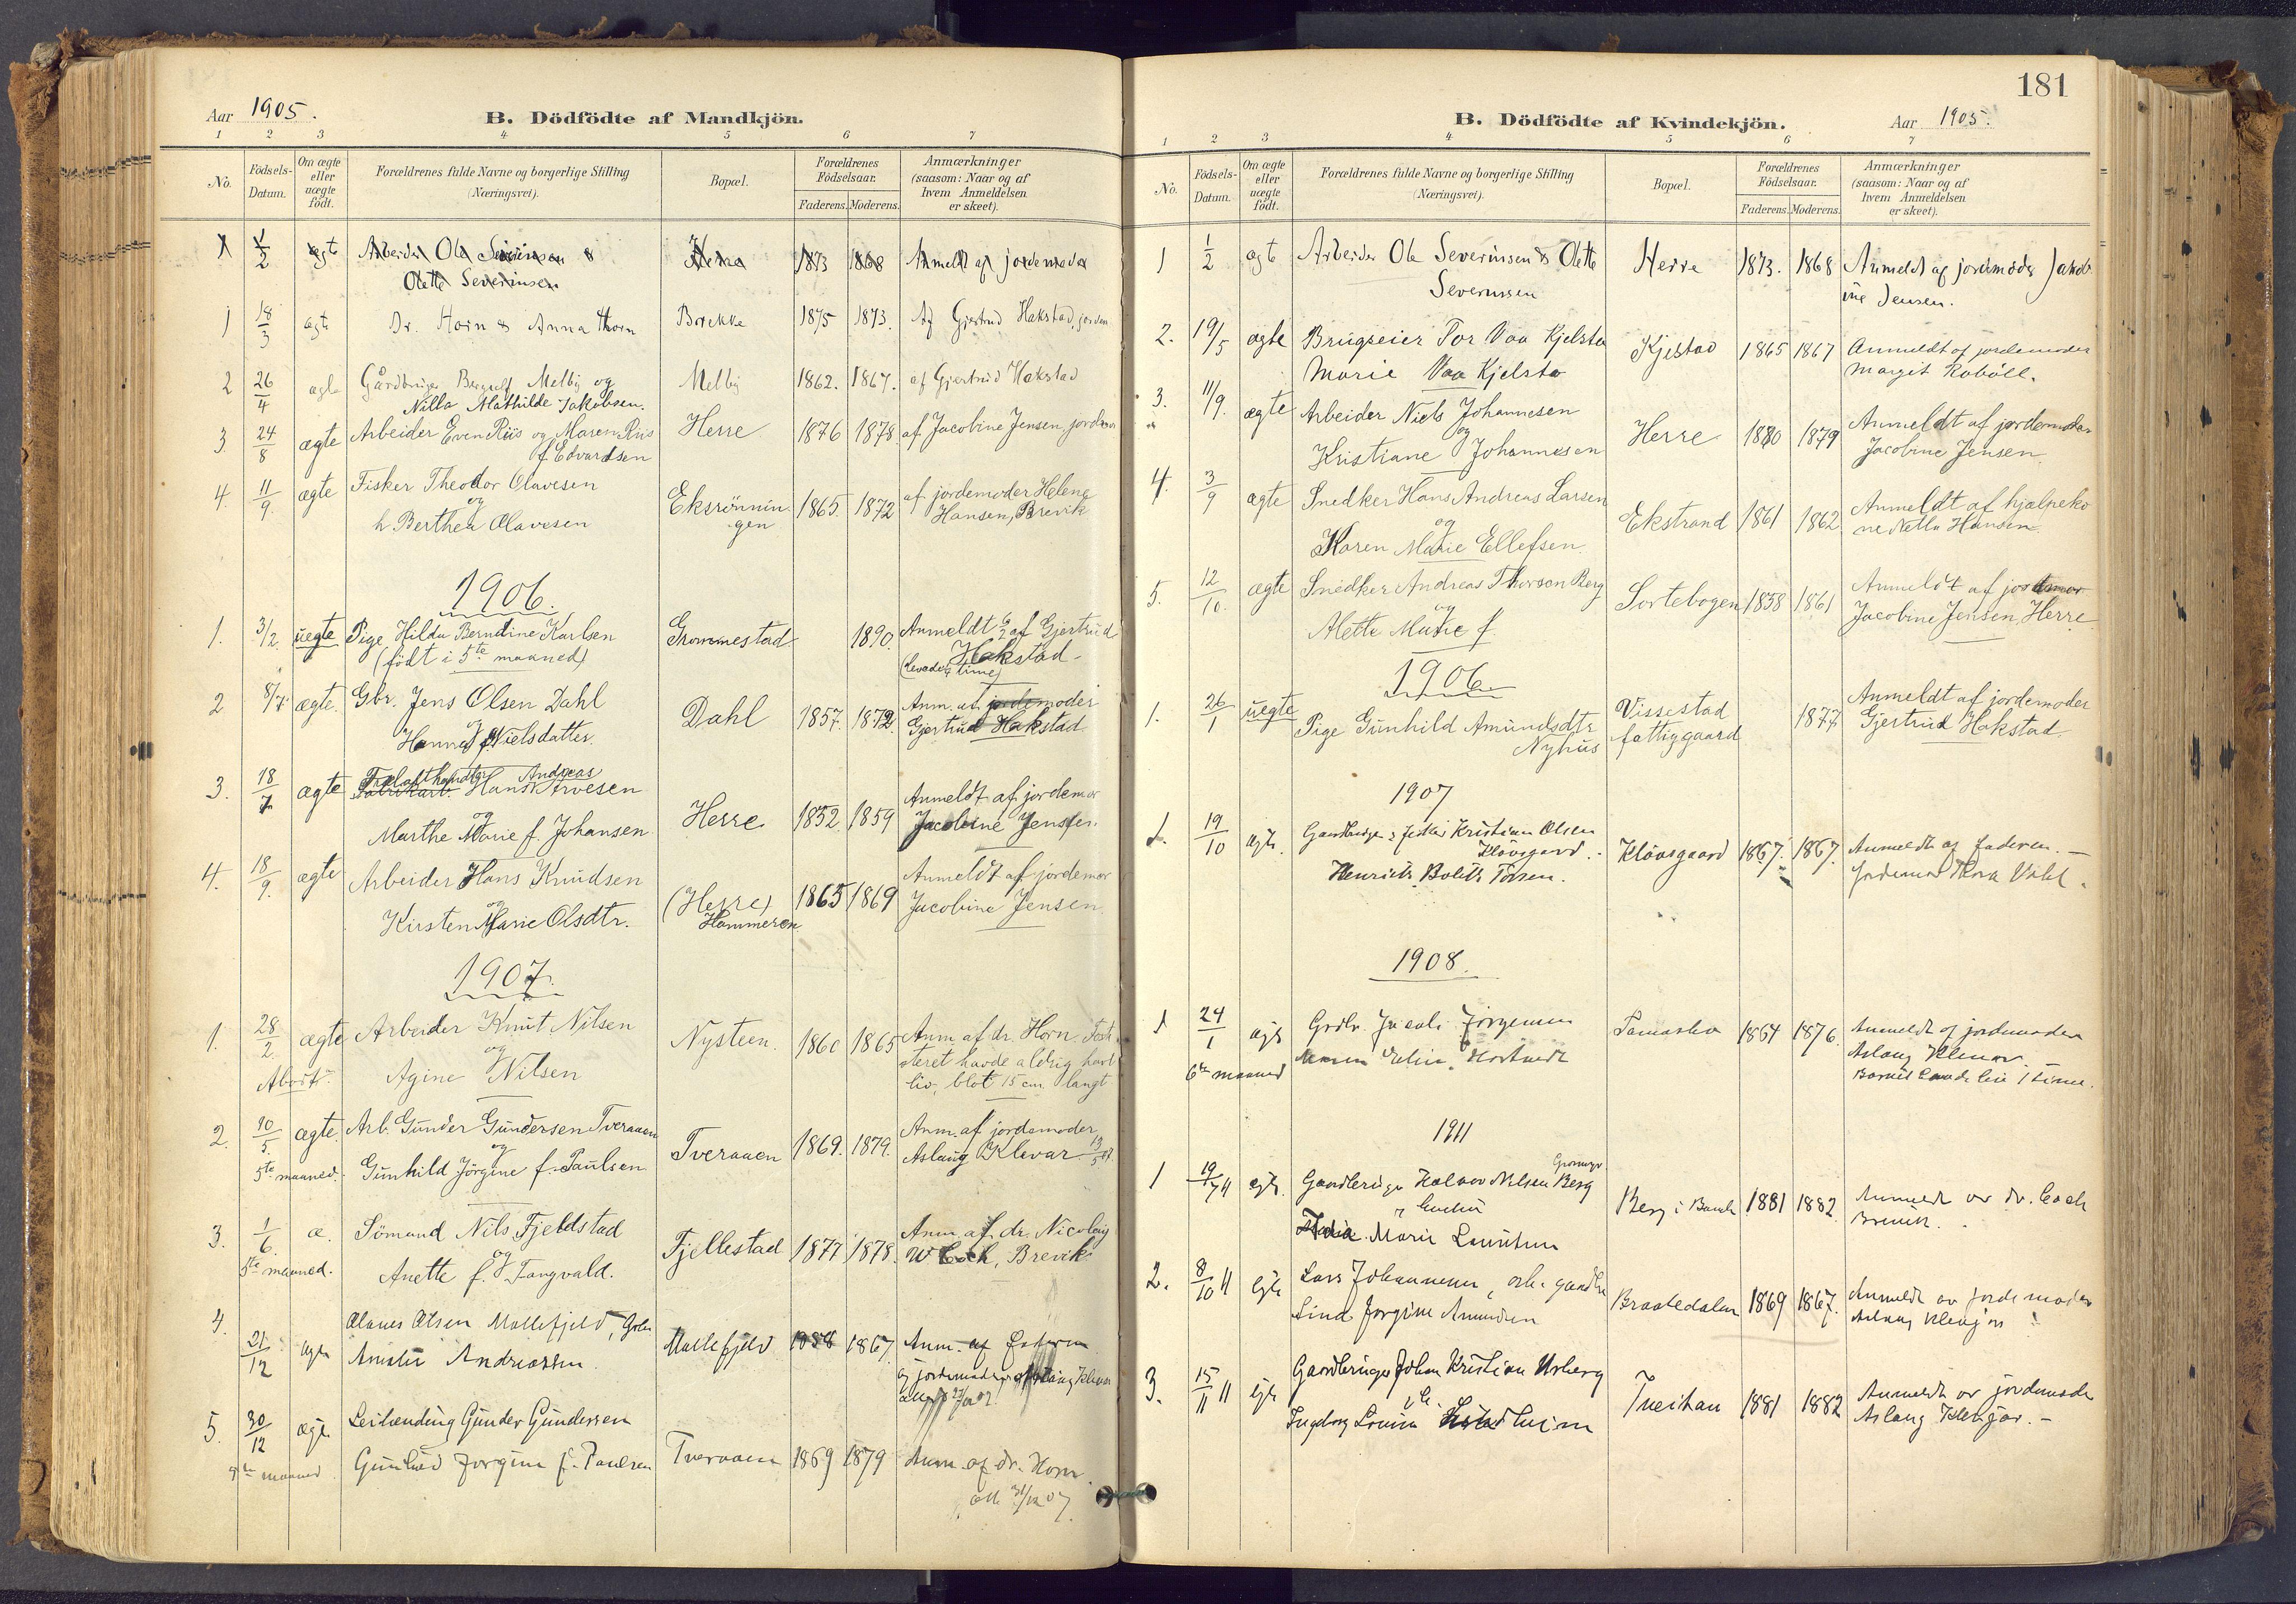 SAKO, Bamble kirkebøker, F/Fa/L0009: Ministerialbok nr. I 9, 1901-1917, s. 181